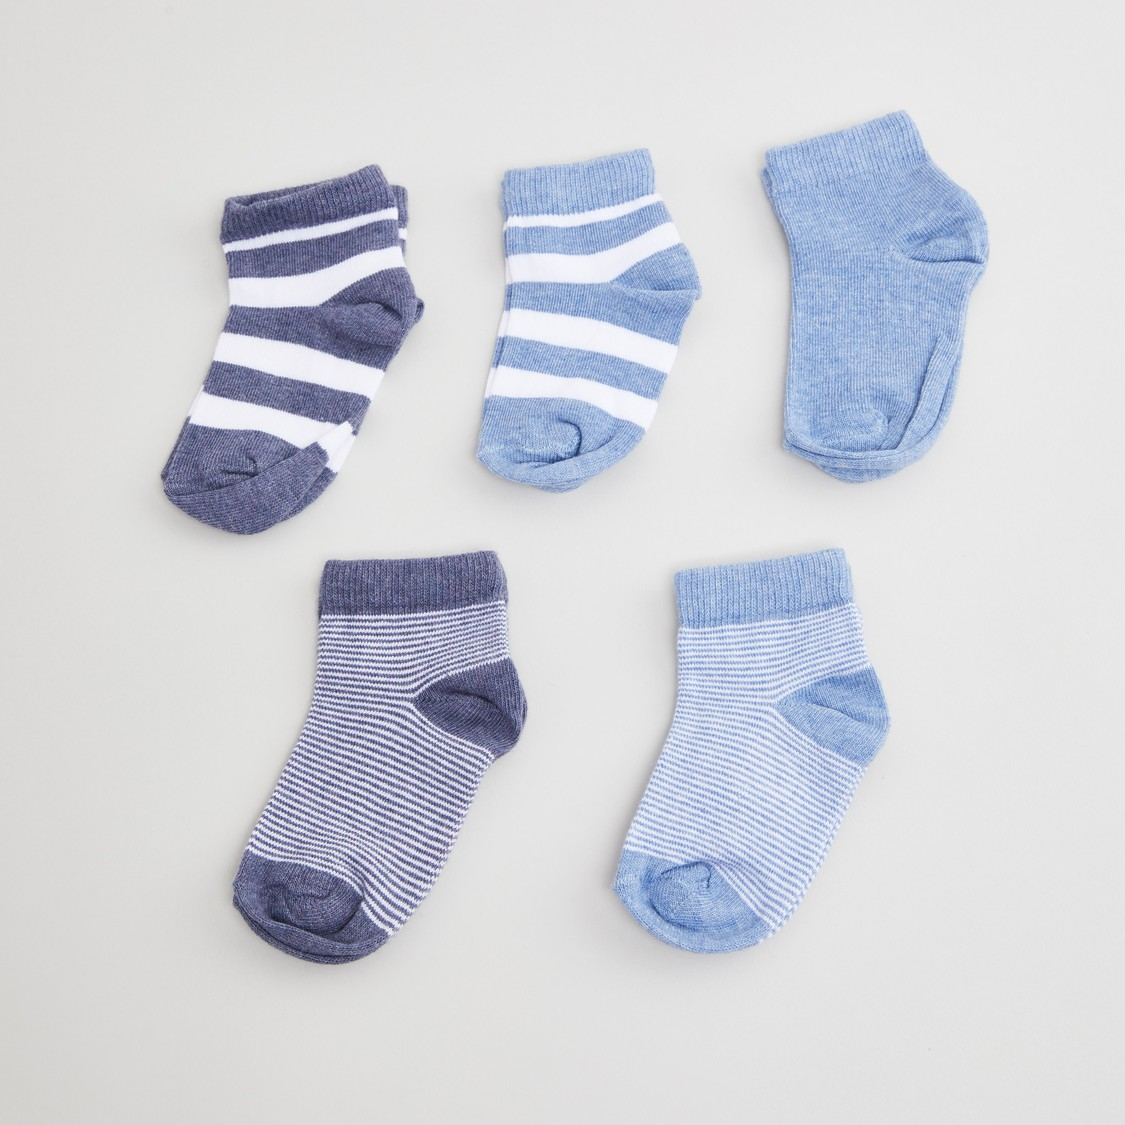 Set of 5 - Assorted Ankle Length Socks with Cuffed Hem